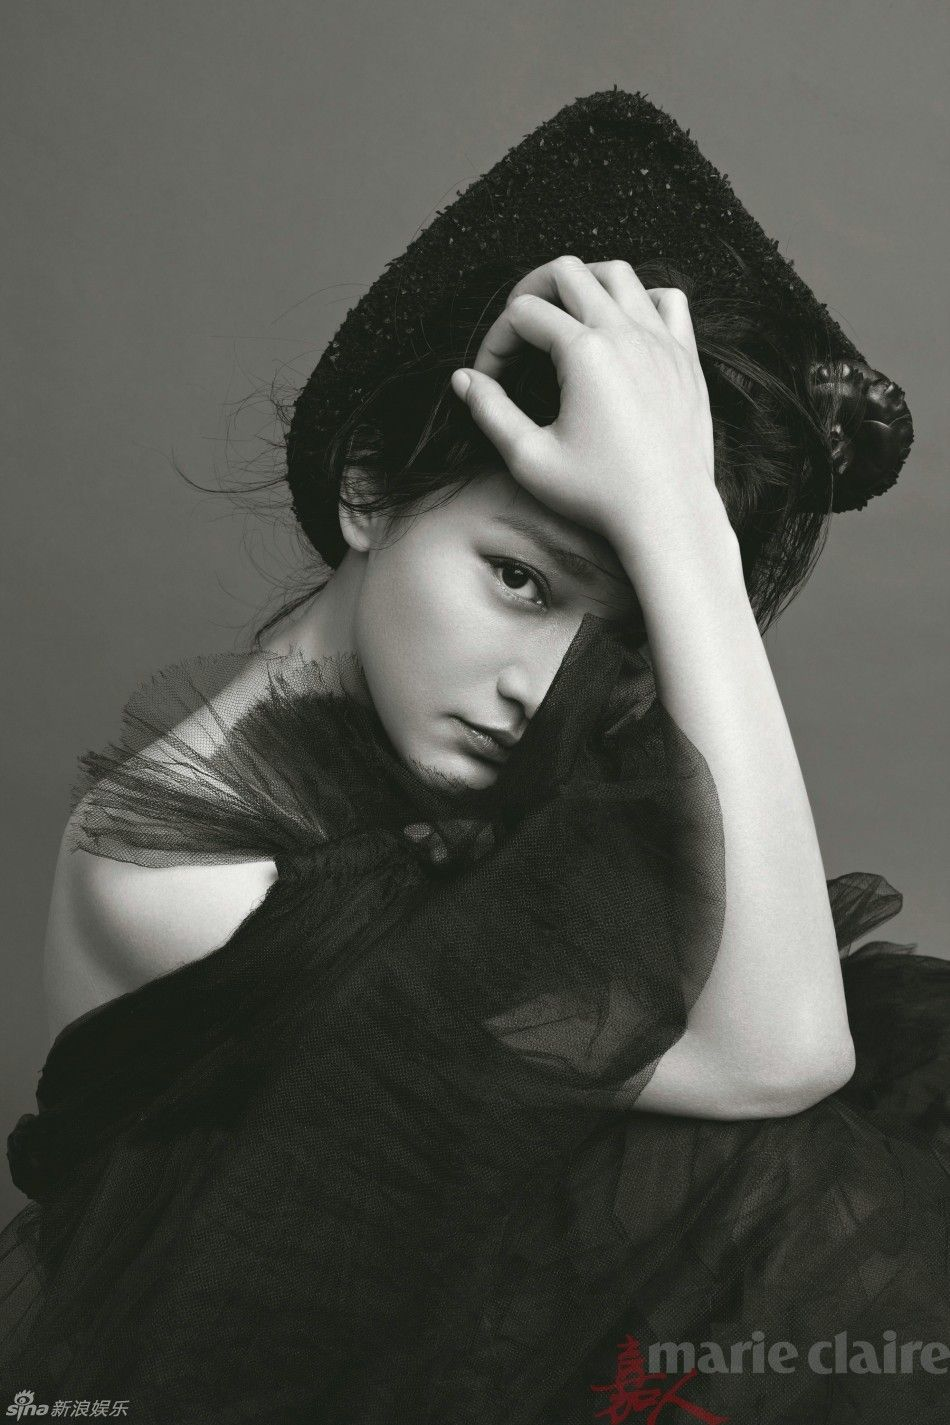 Chase Carter BHS,Zohra Lampert XXX pic Jasmine Curtis-Smith (b. 1994),Tomoko Tabata